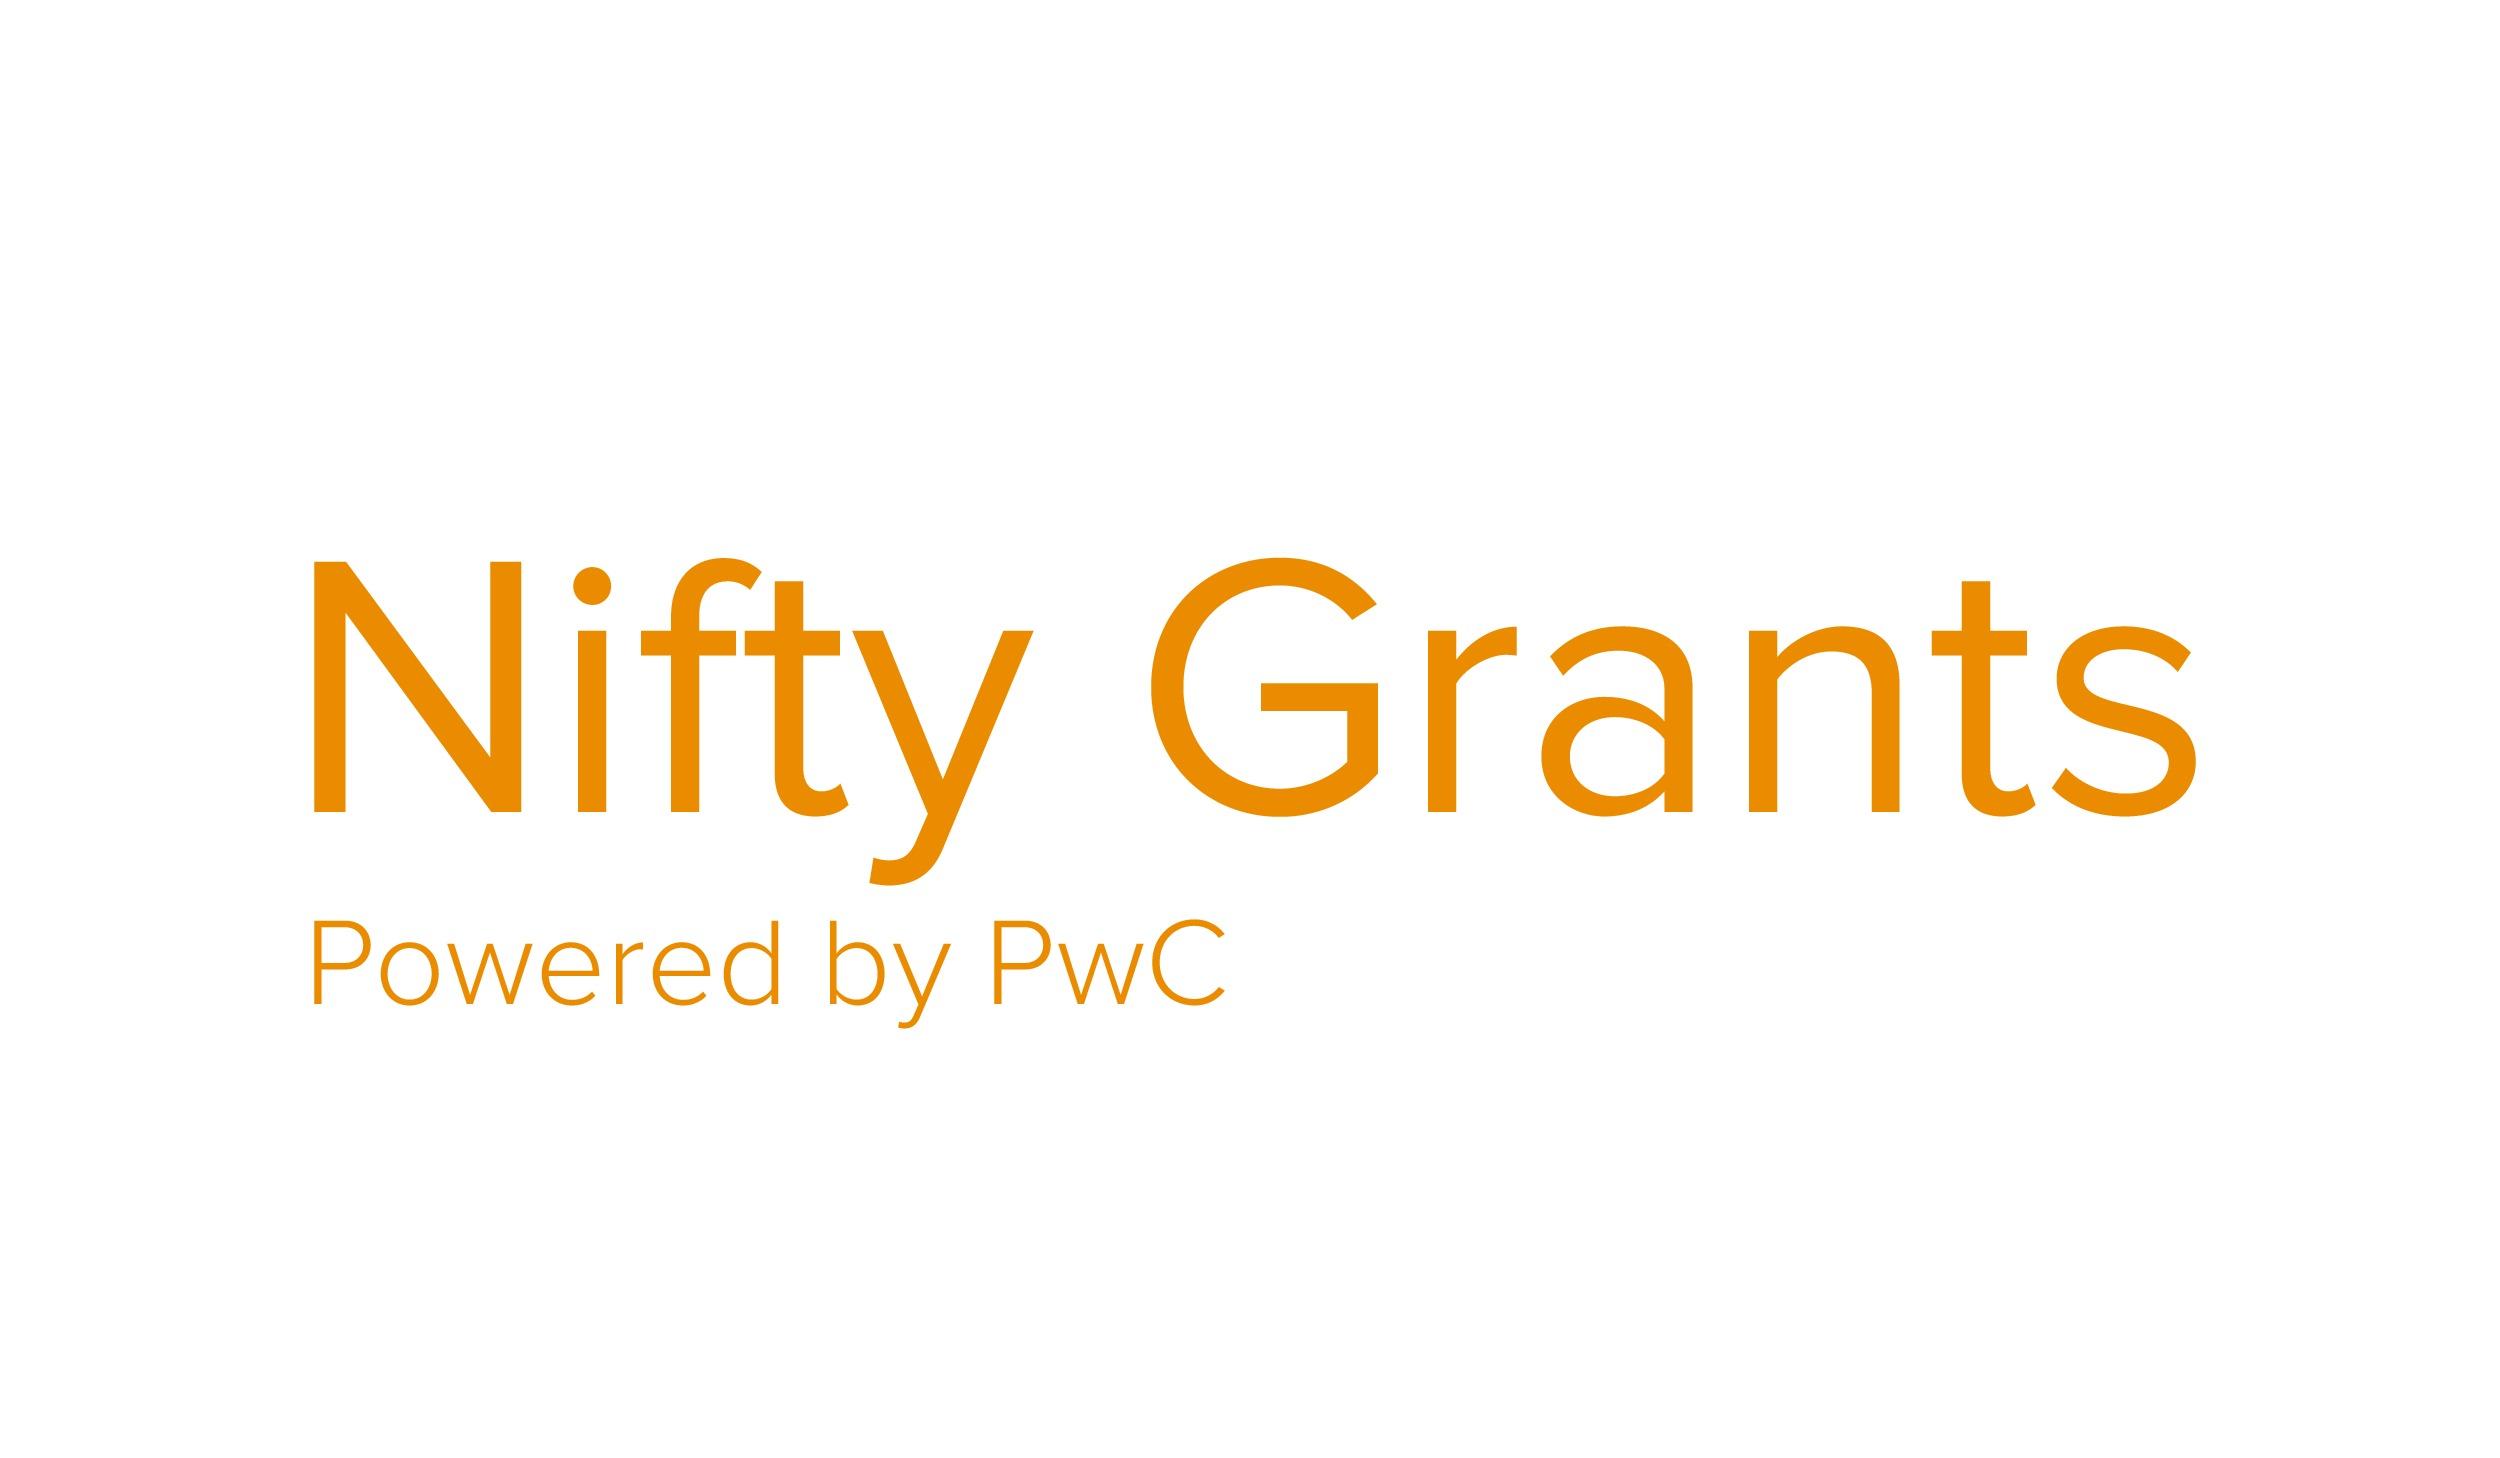 PwC's Nifty Grants